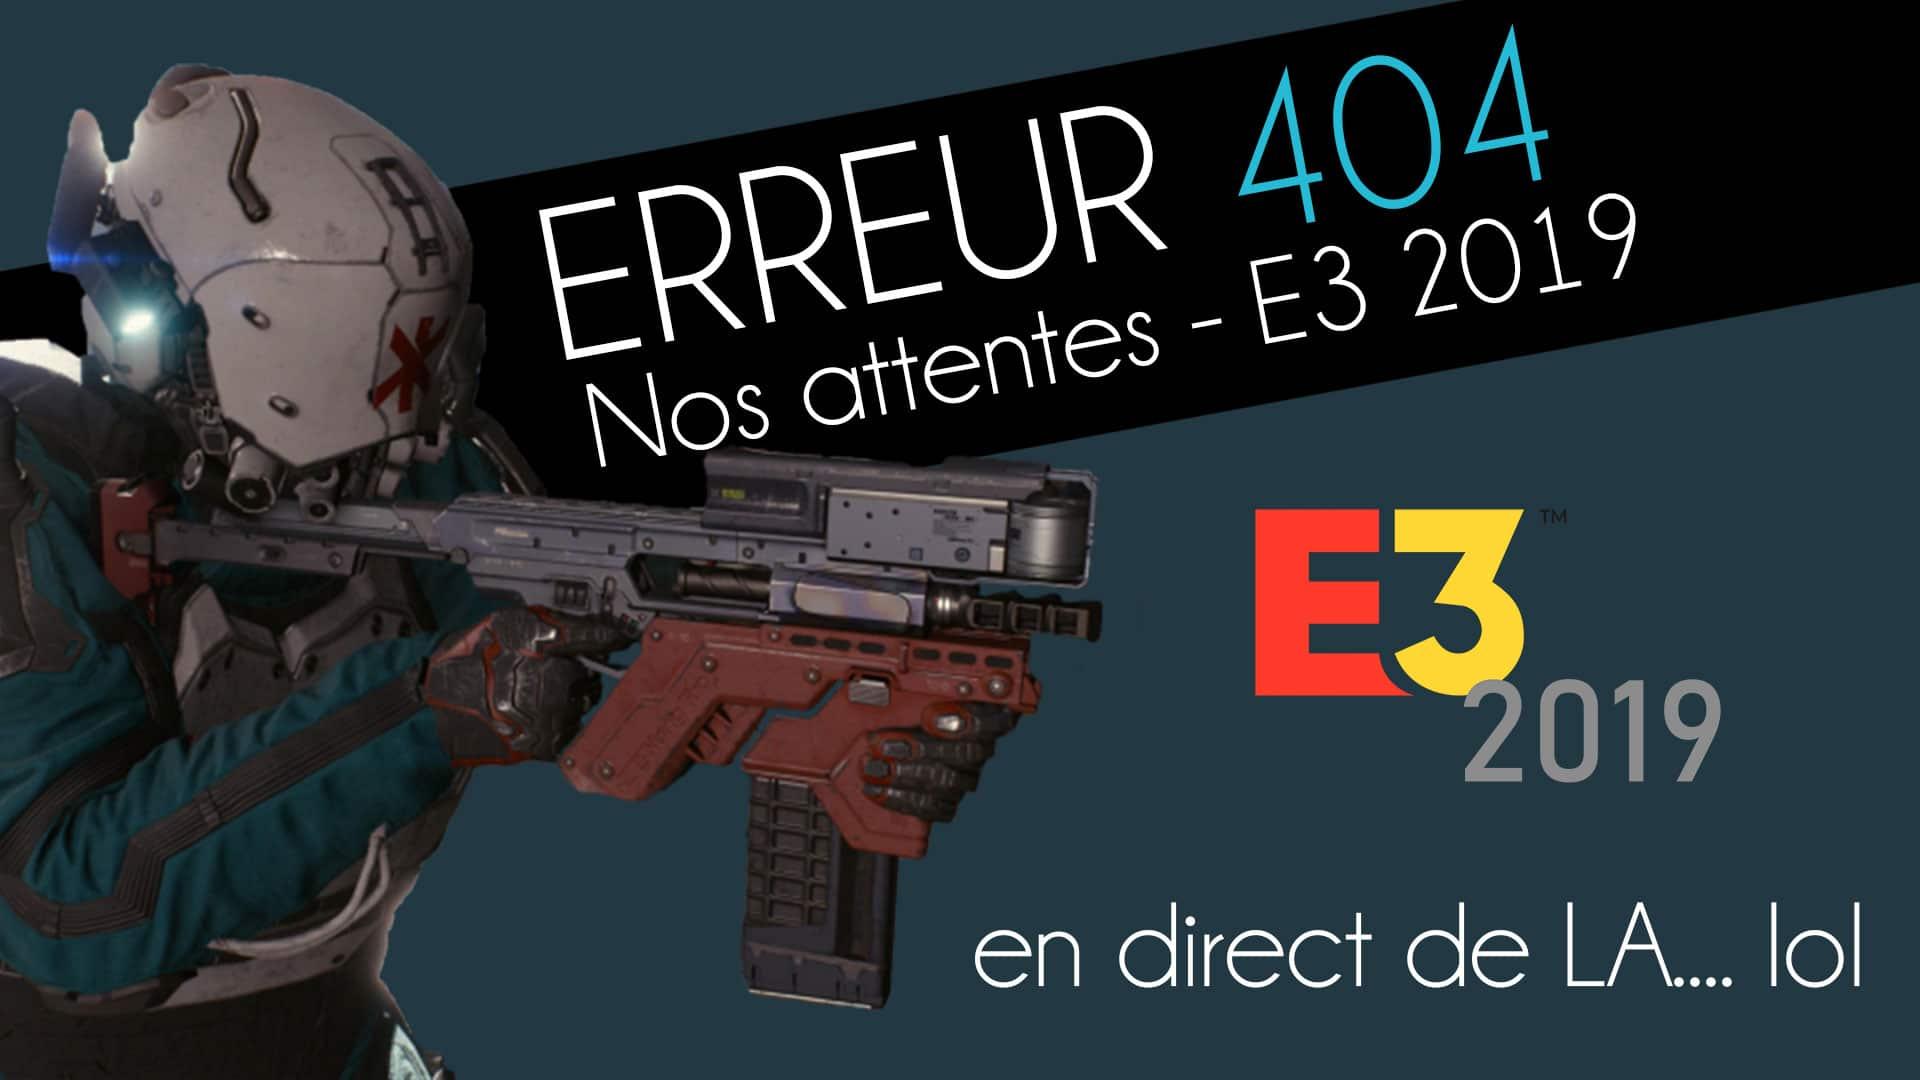 ERREUR-404-e3-2019